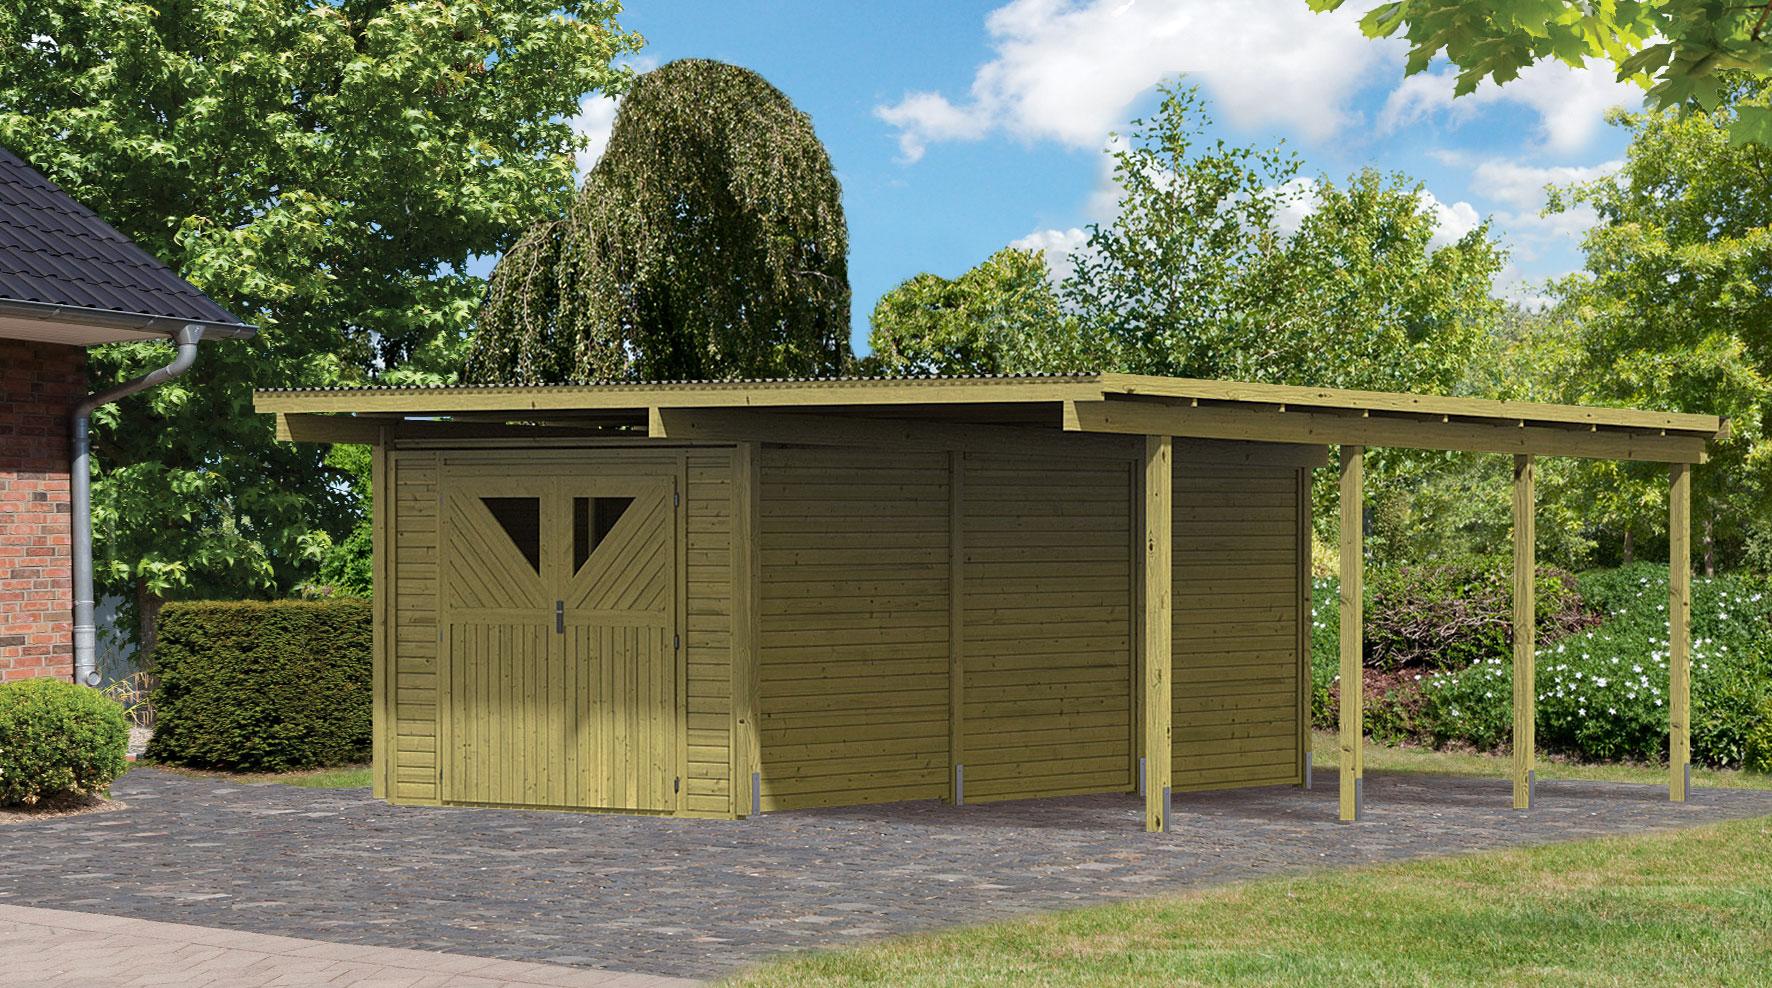 karibu eco carport mit abstellraum 3 kdi 563x676cm bei. Black Bedroom Furniture Sets. Home Design Ideas